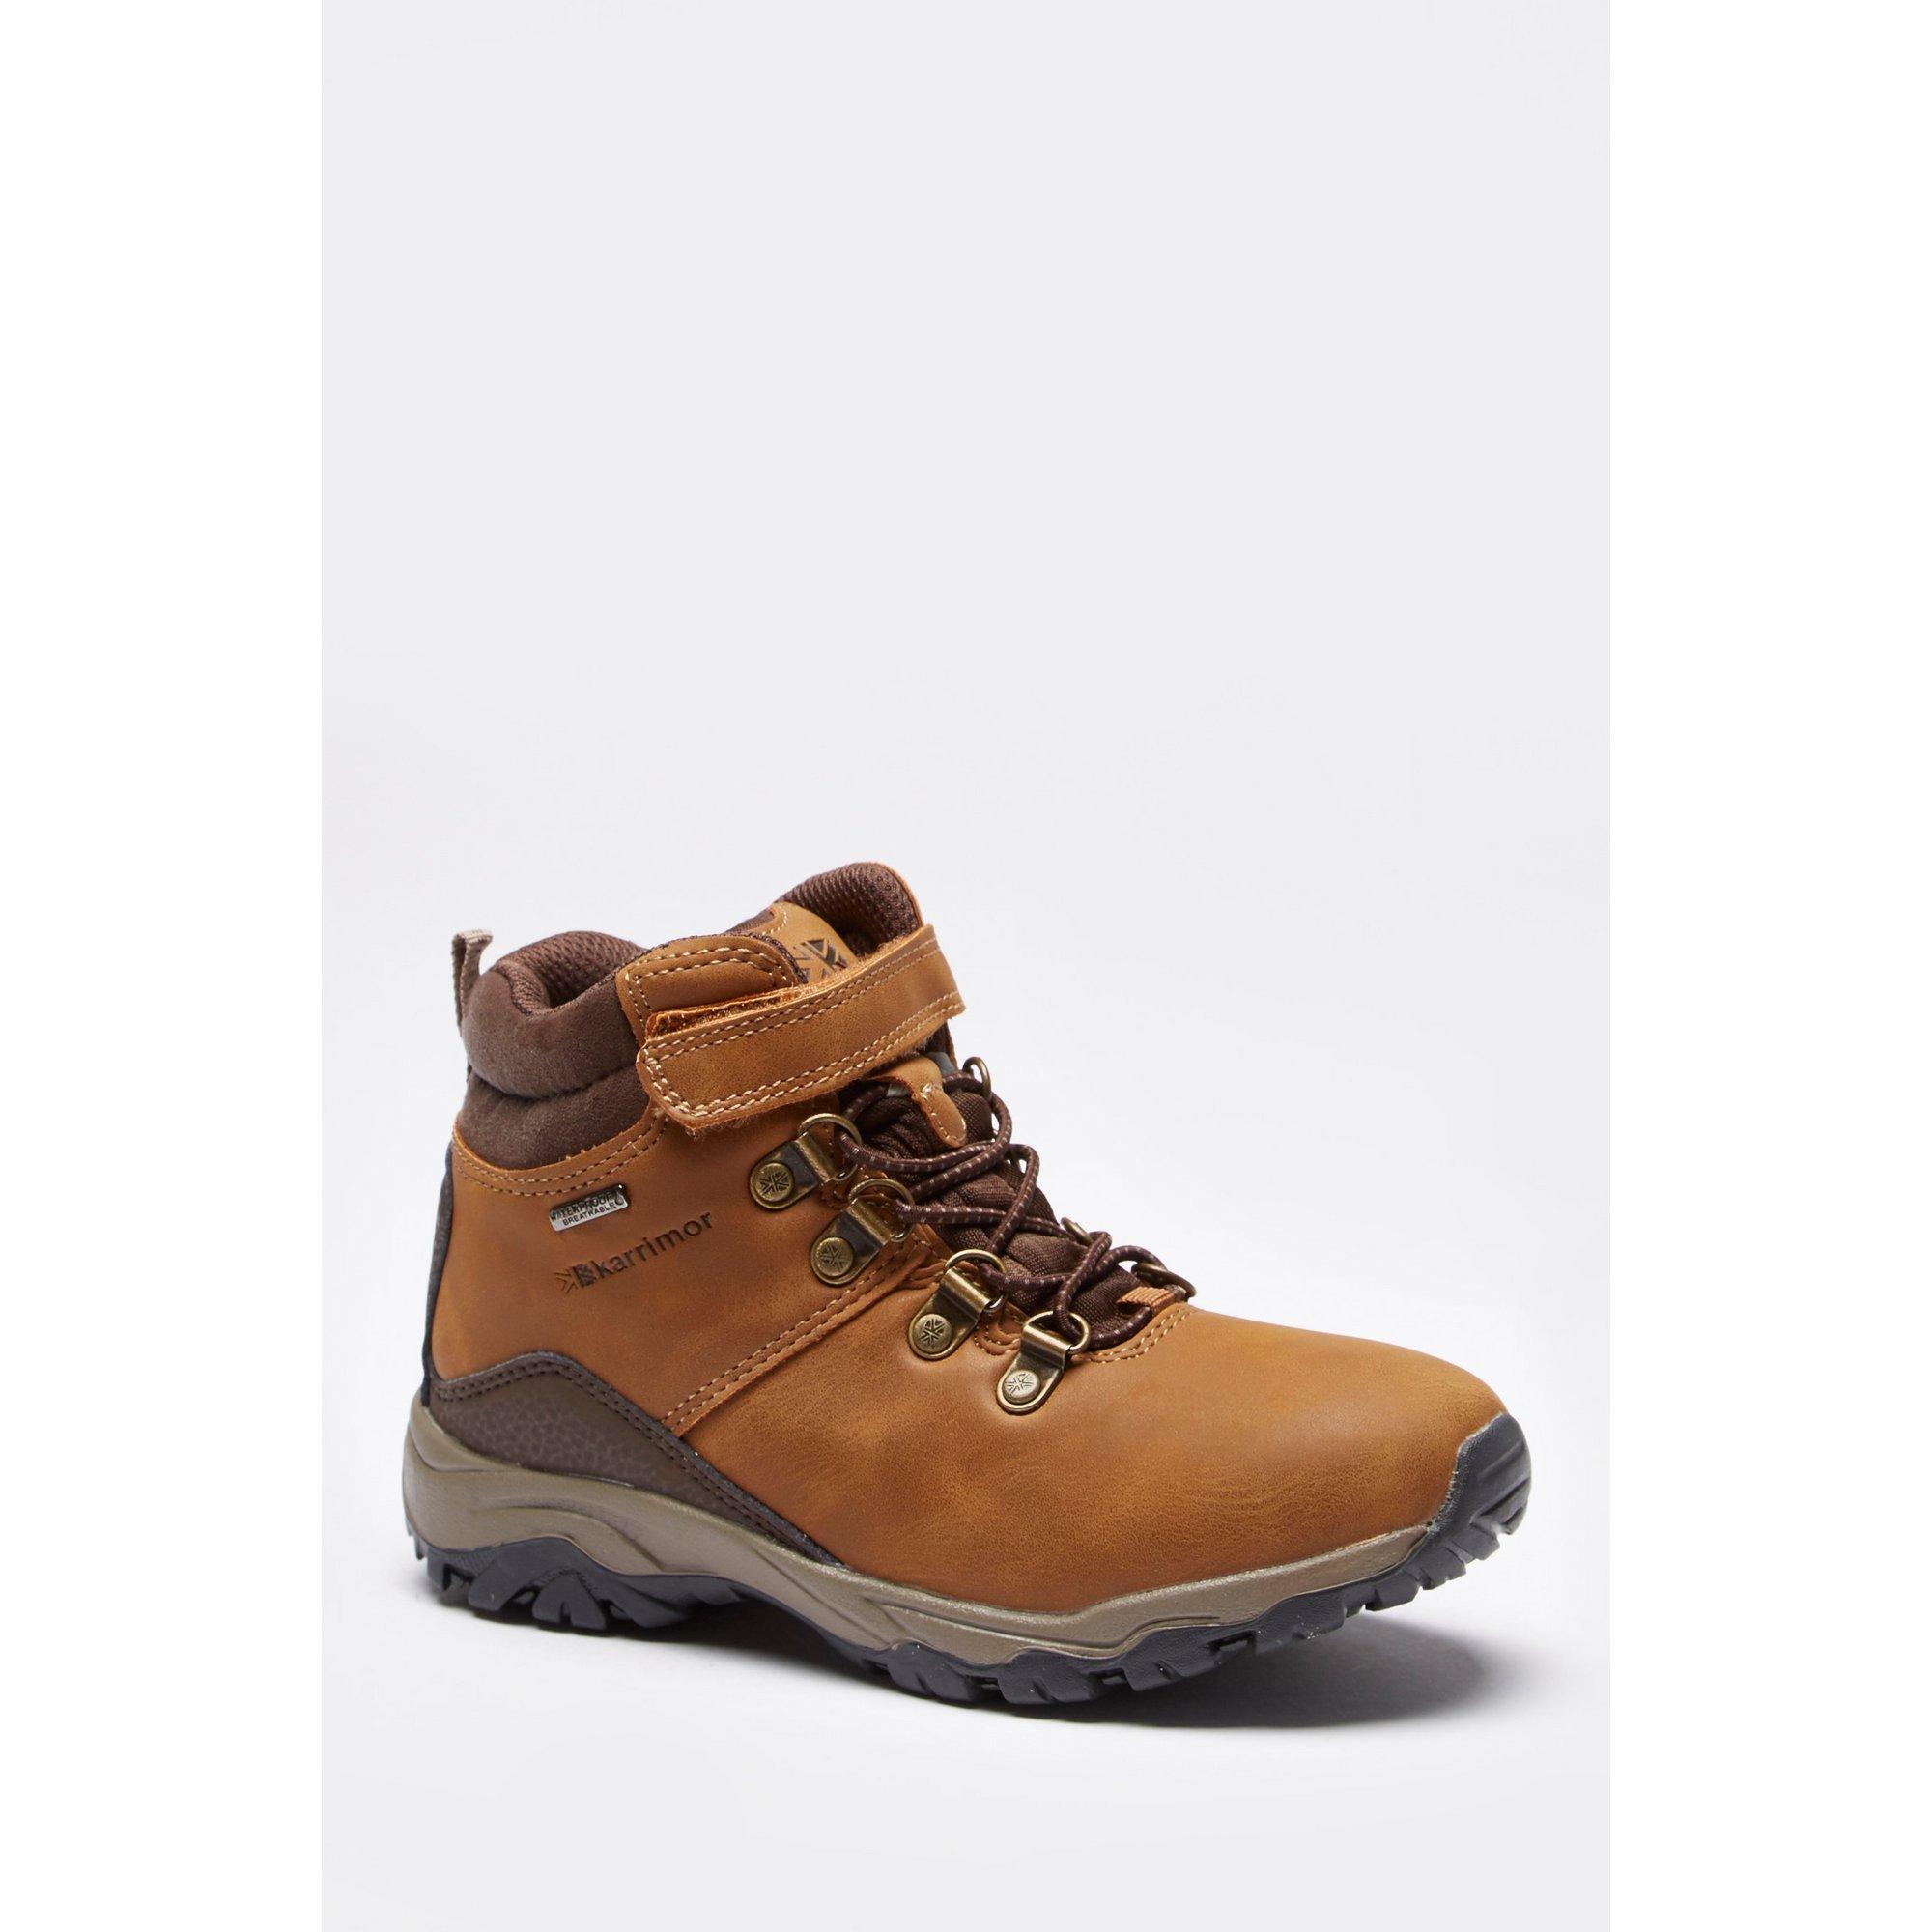 Image of Karrimor Mendip Unisex Lace Up Walking Boots